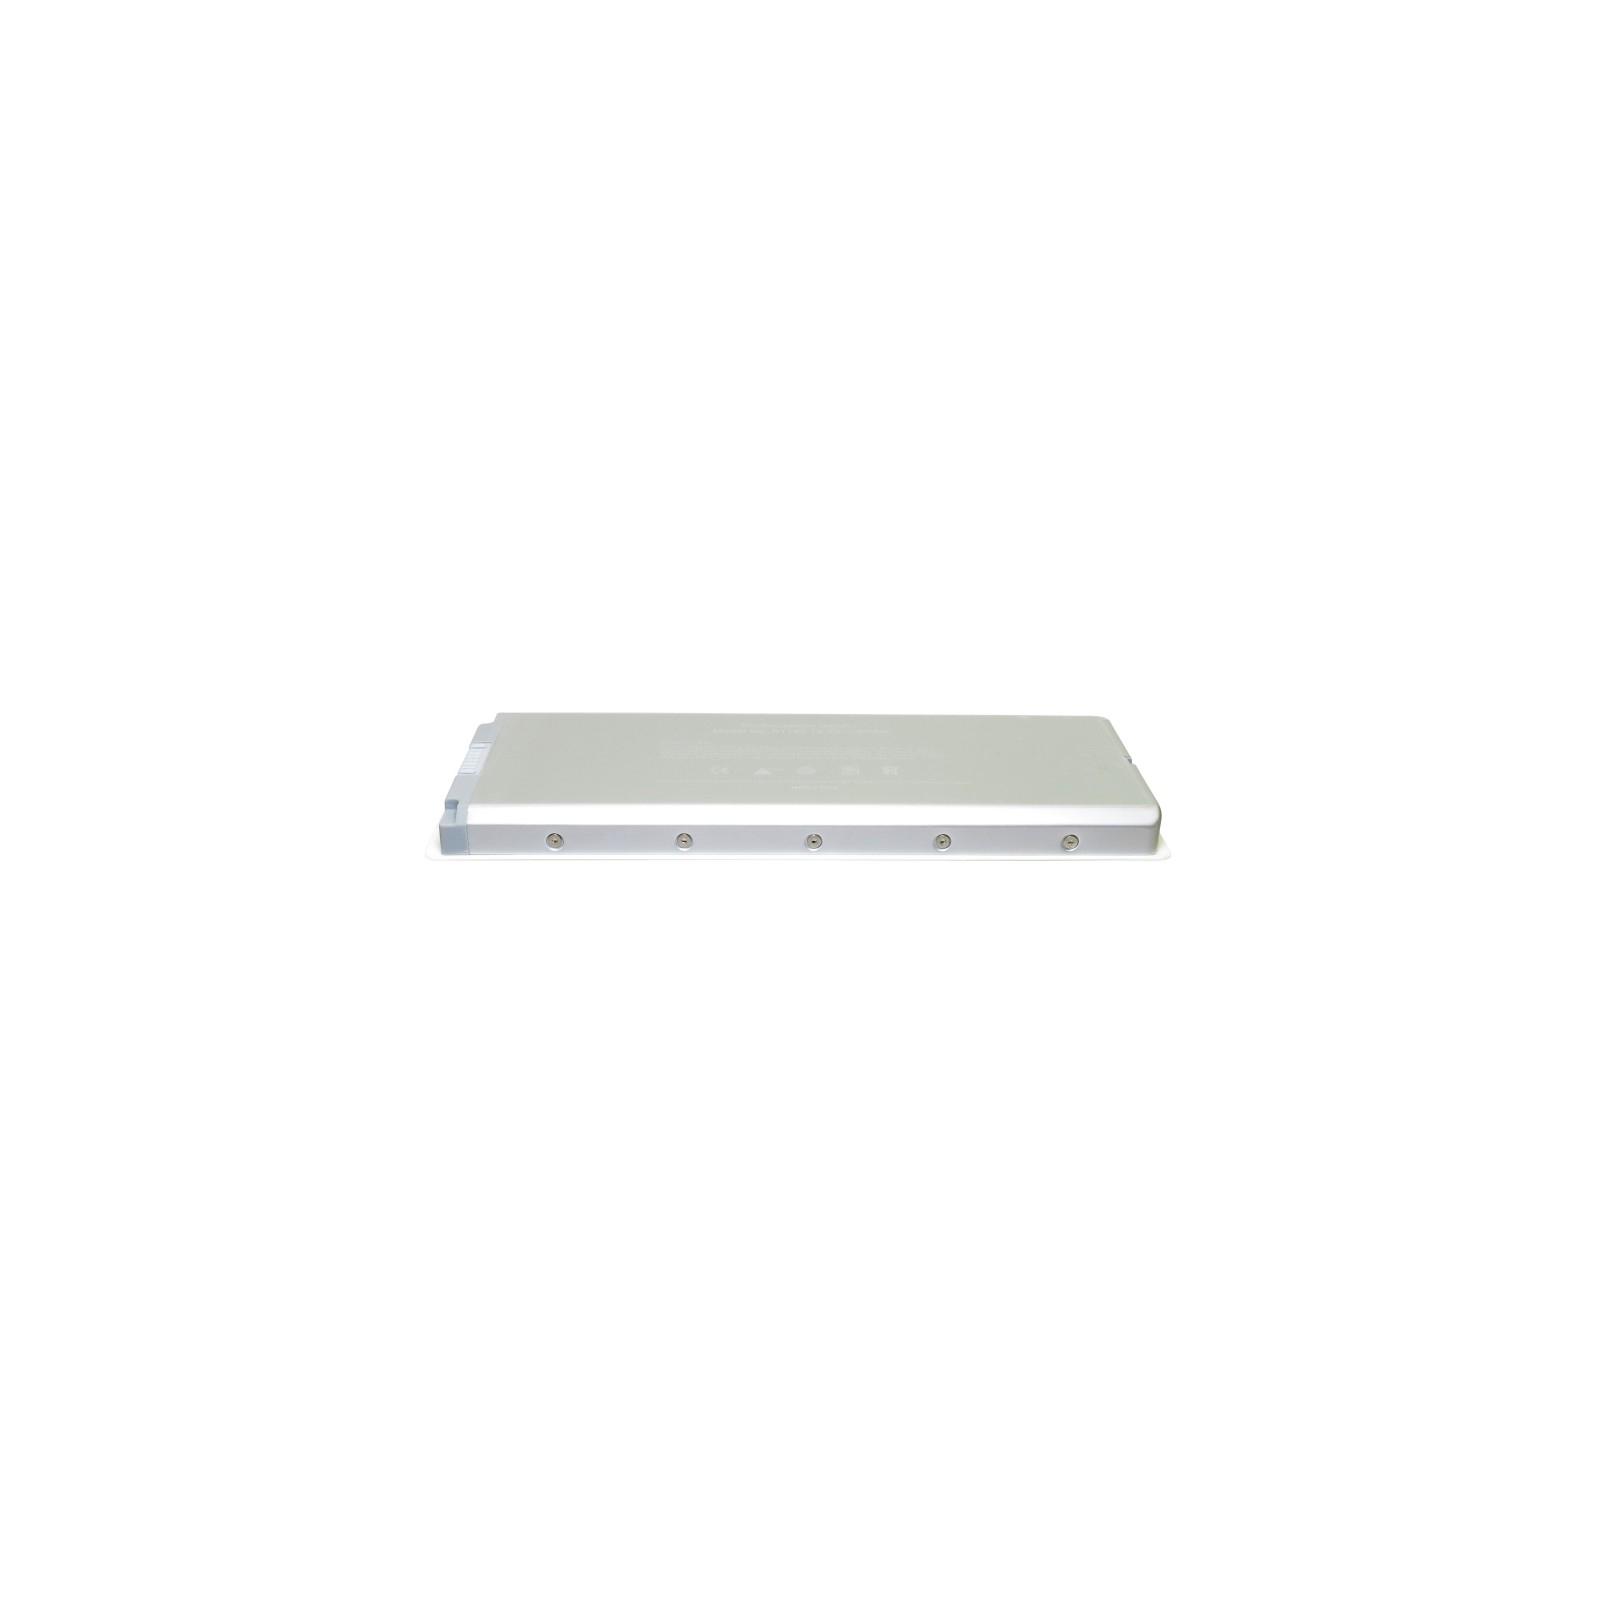 Аккумулятор для ноутбука APPLE A1185 (5550 mAh) White EXTRADIGITAL (BNA3901) изображение 3